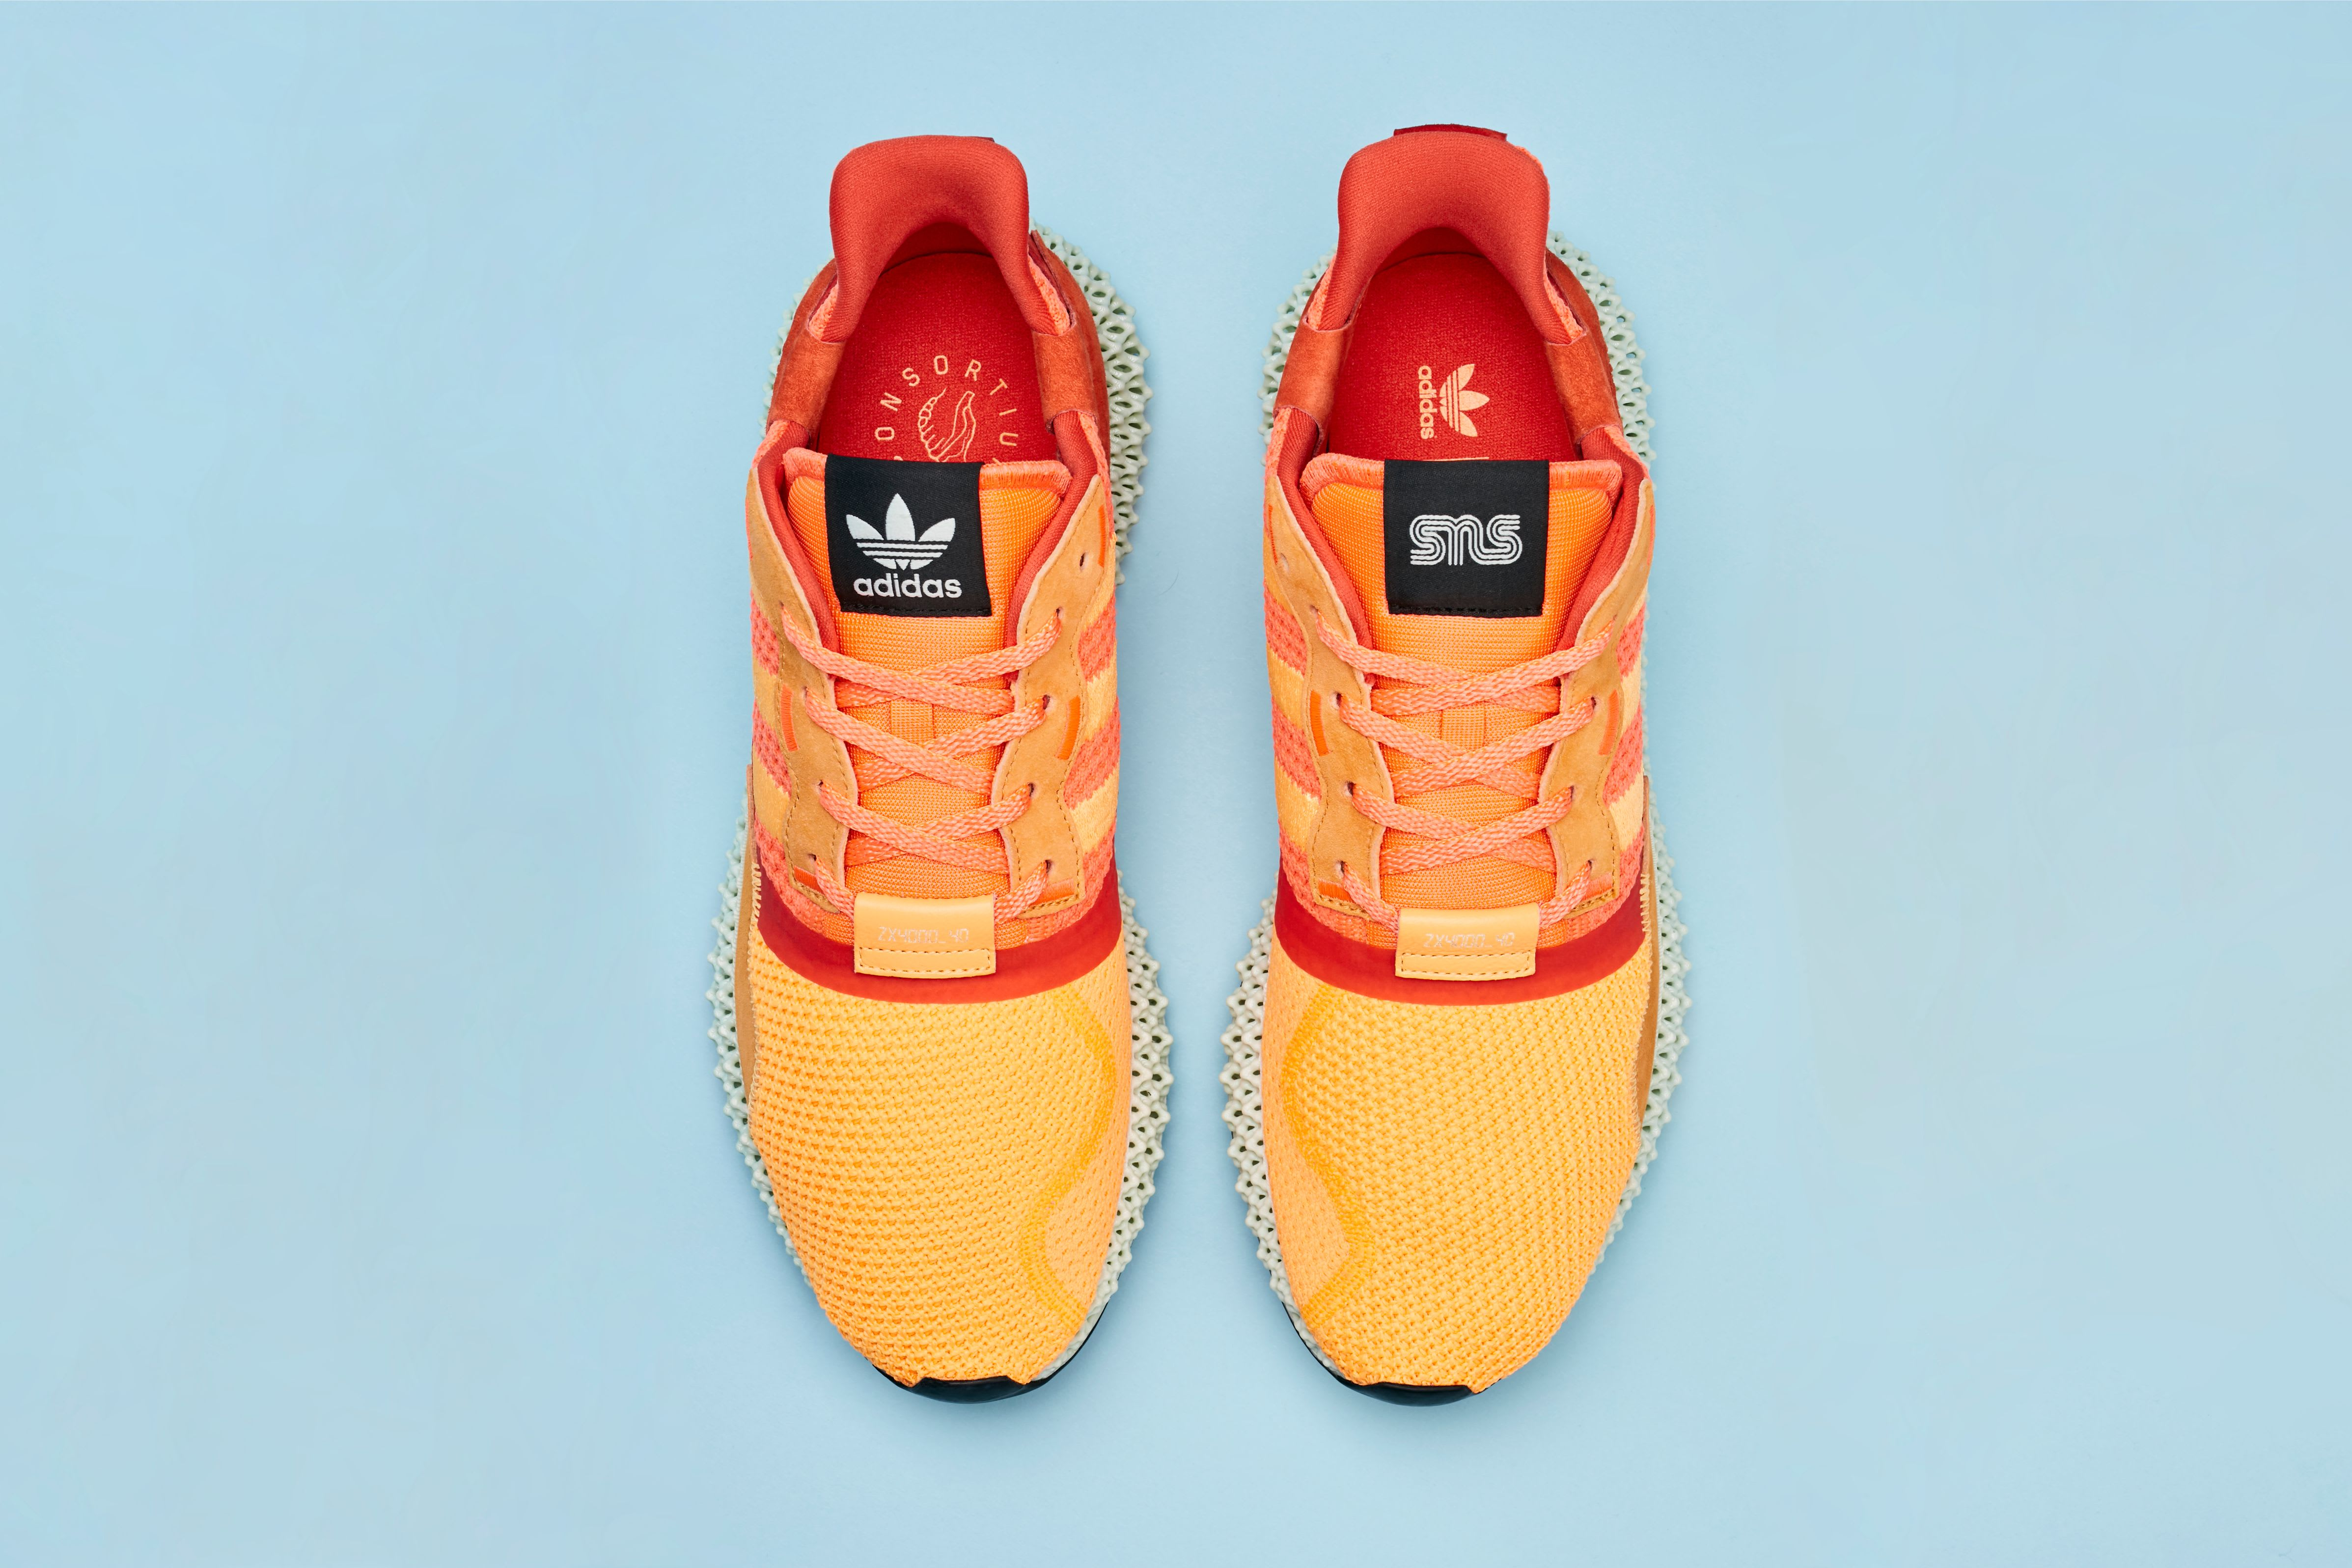 Sneakersnstuff x Adidas Consortium ZX 4000 4D 'Sunrise' (Top)